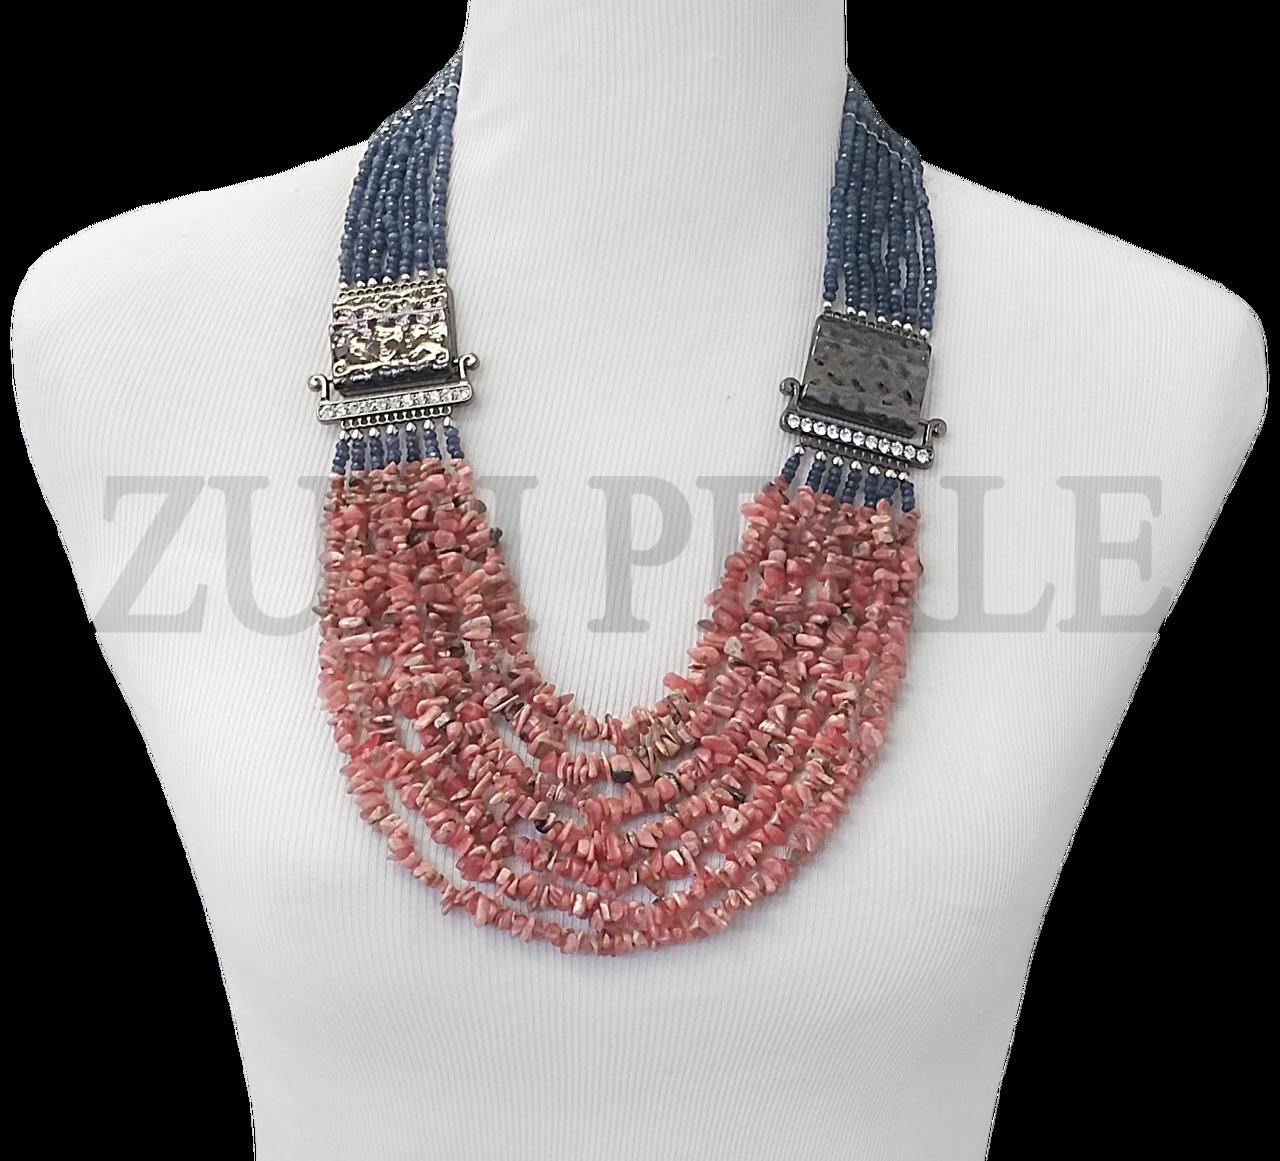 Zuri Perle - ZPP400 - Handmade Rhodochrosite Beads African Wedding Necklace , $220.00 (http://www.zuriperle.com/new-arrivals/zpp400-handmade-rhodochrosite-beads-african-wedding-necklace.html)  #zuriperle #zuriperlejewelry #madeintheusa #handmadejewelry #instafashion #instajewelry #womenfashion #jewelry #jewelryaddict #fashion